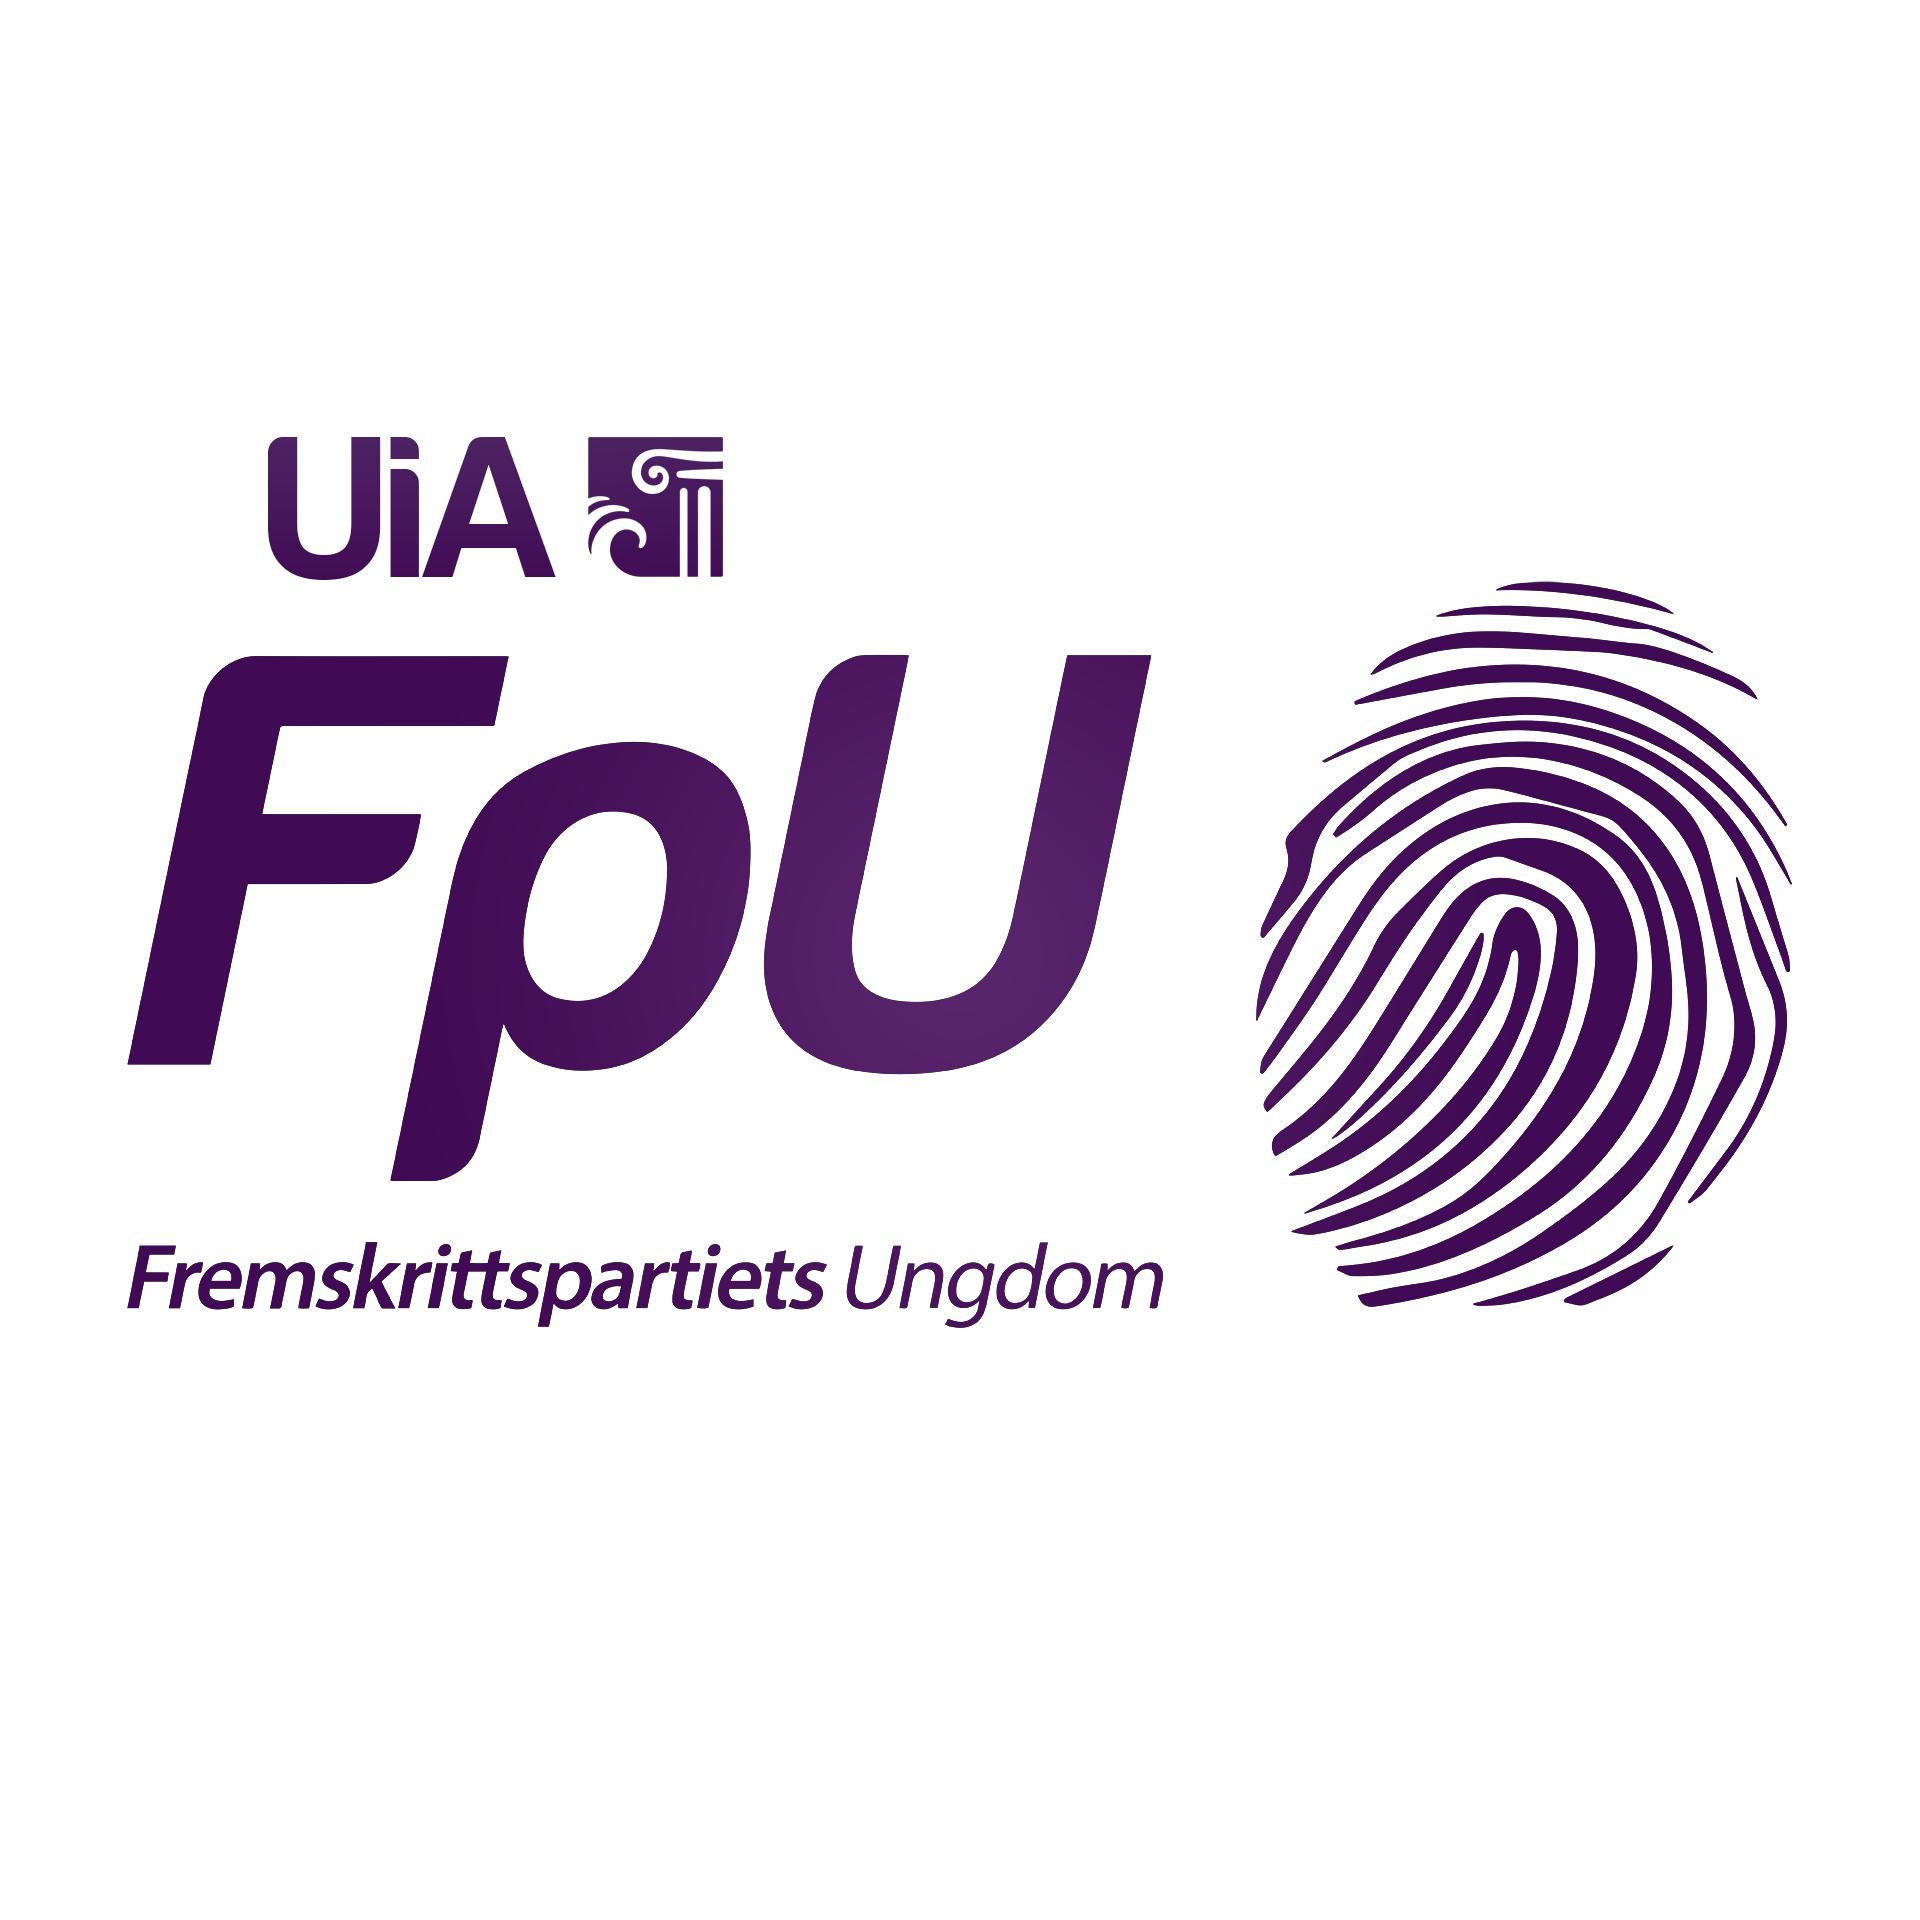 Universitetet i Agder FpU